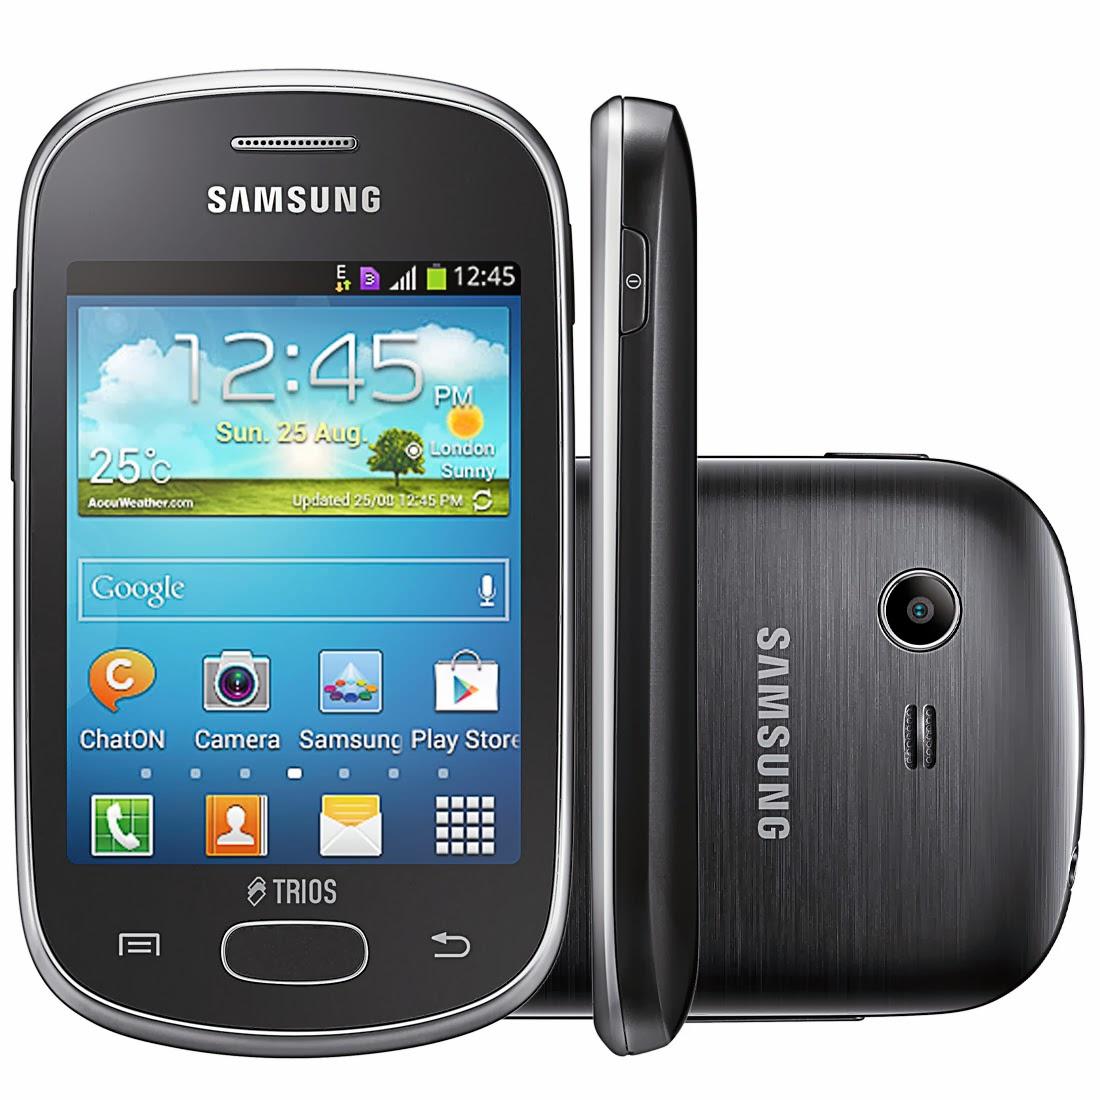 Harga Samsung Galaxy Star Trios dan Spesifikasi Lengkap